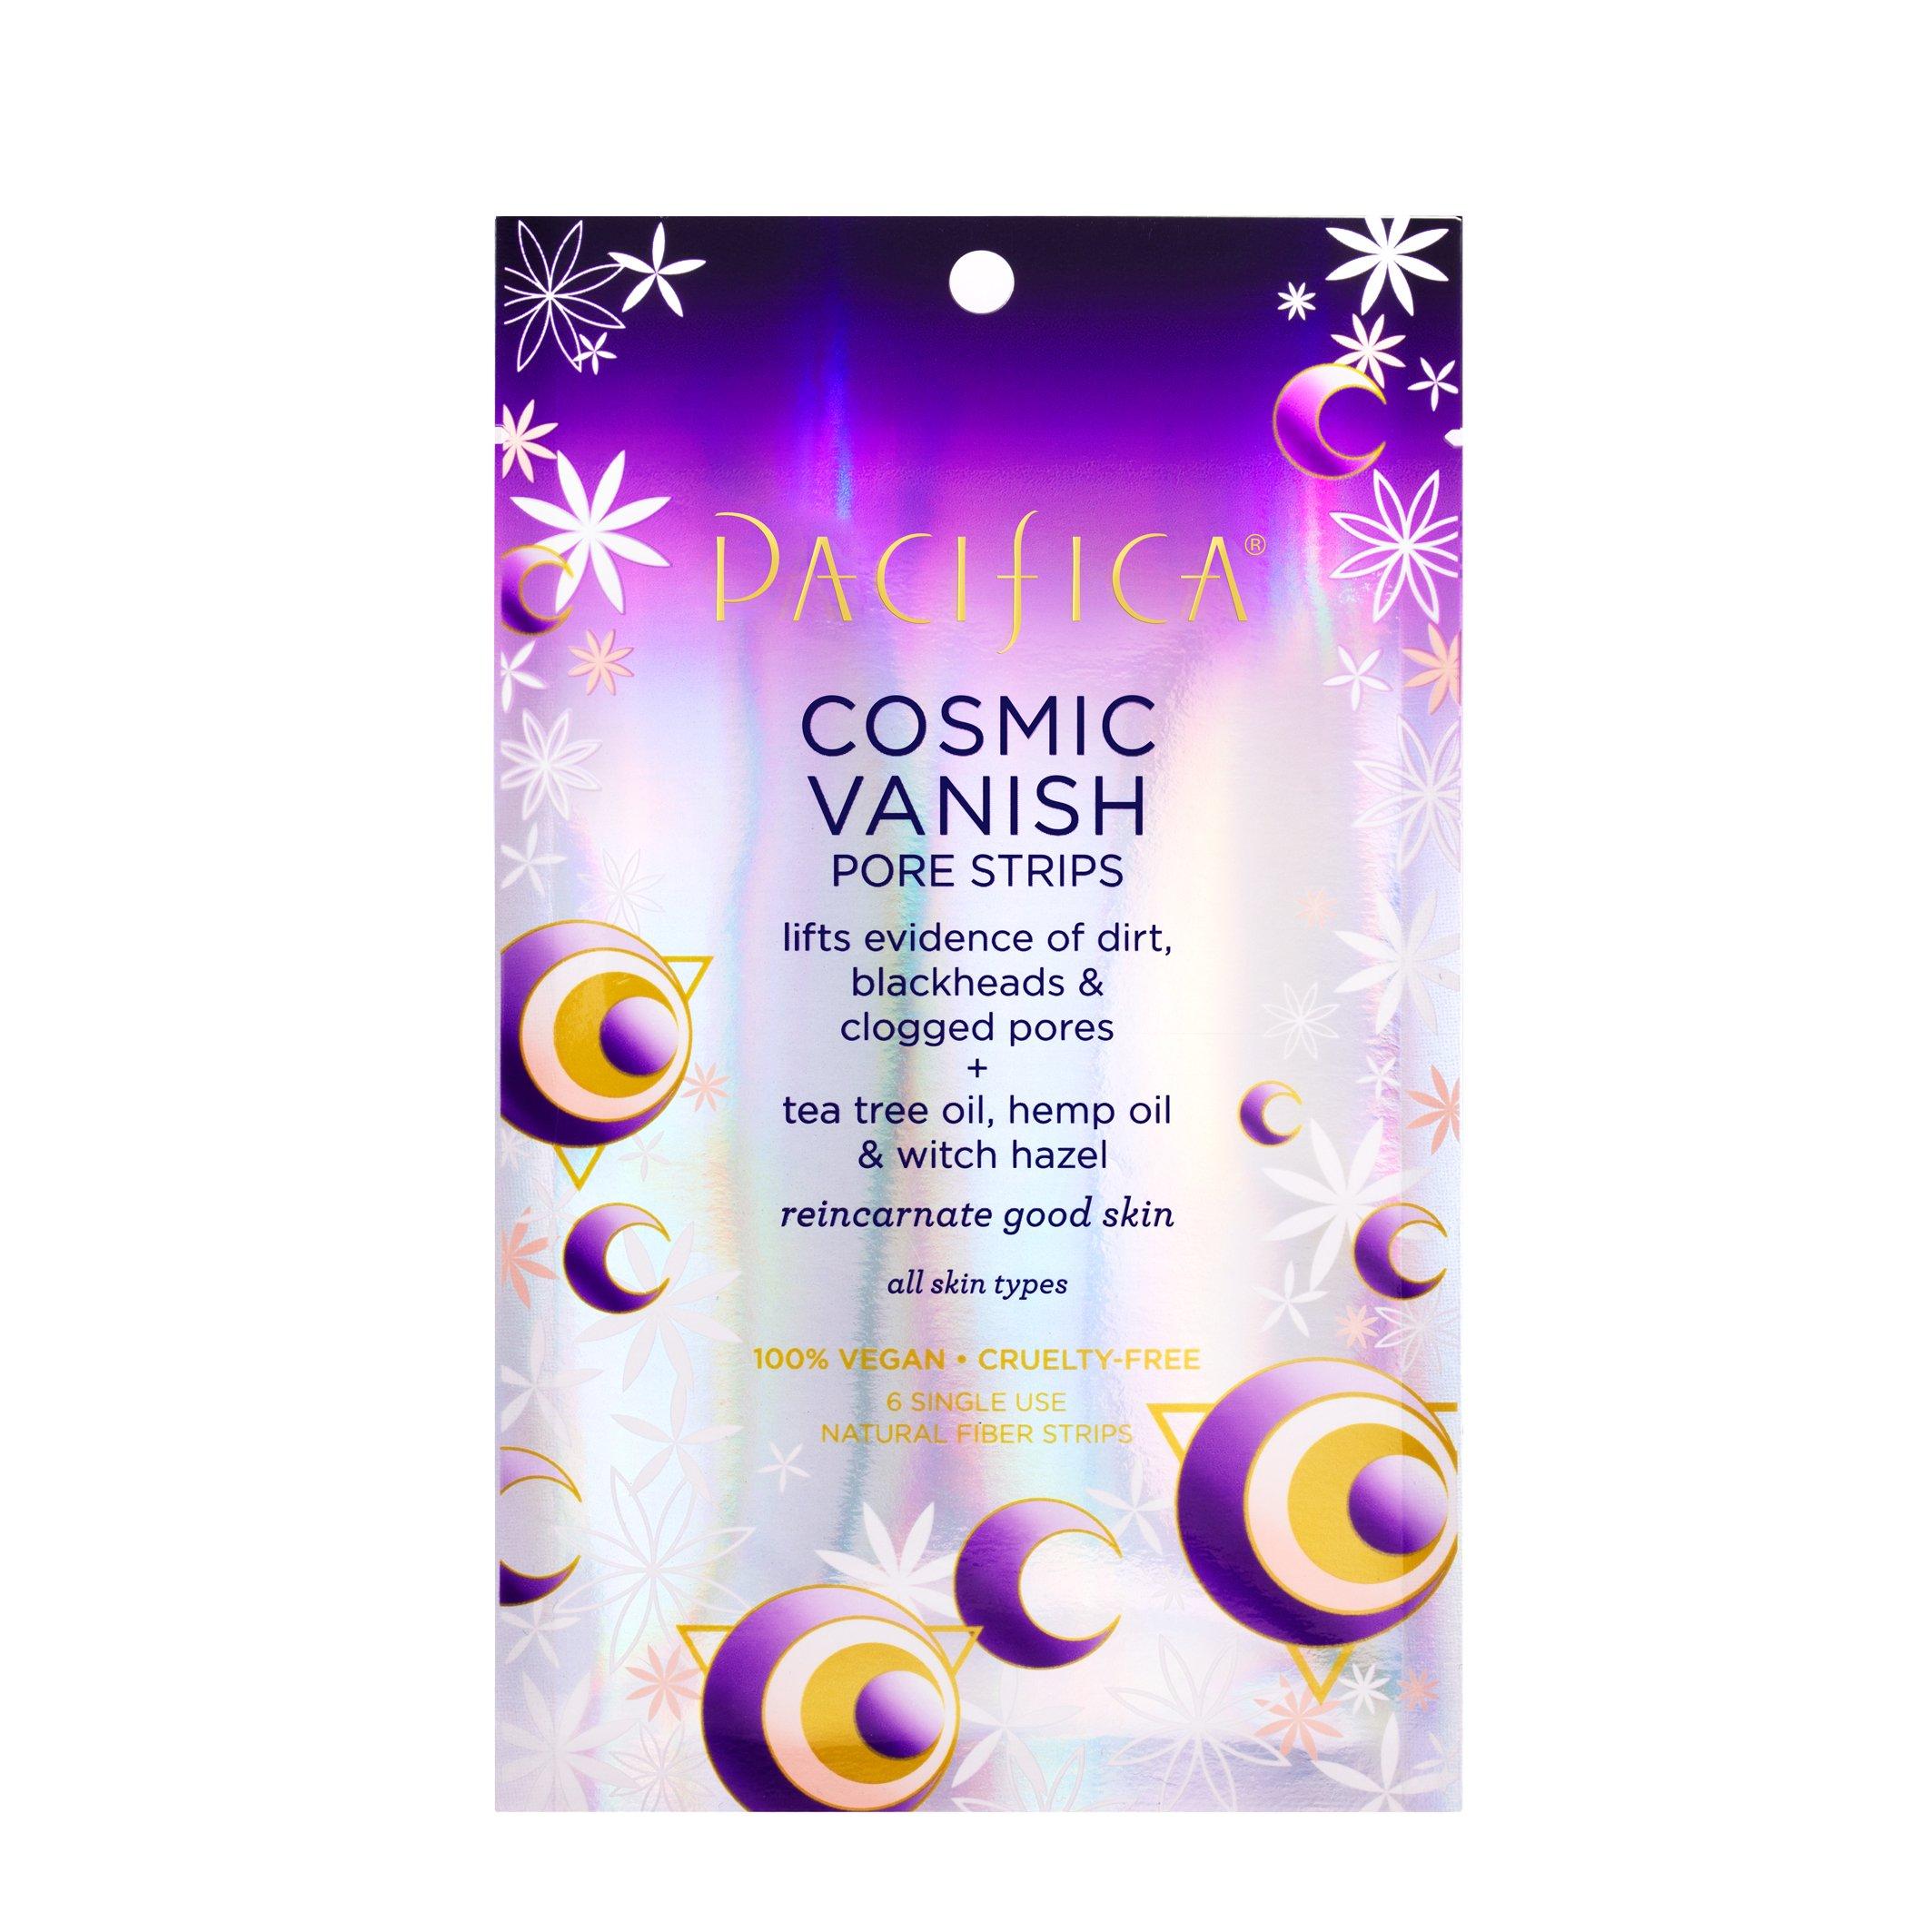 Pacifica Beauty Cosmic Vanish Pore Strips